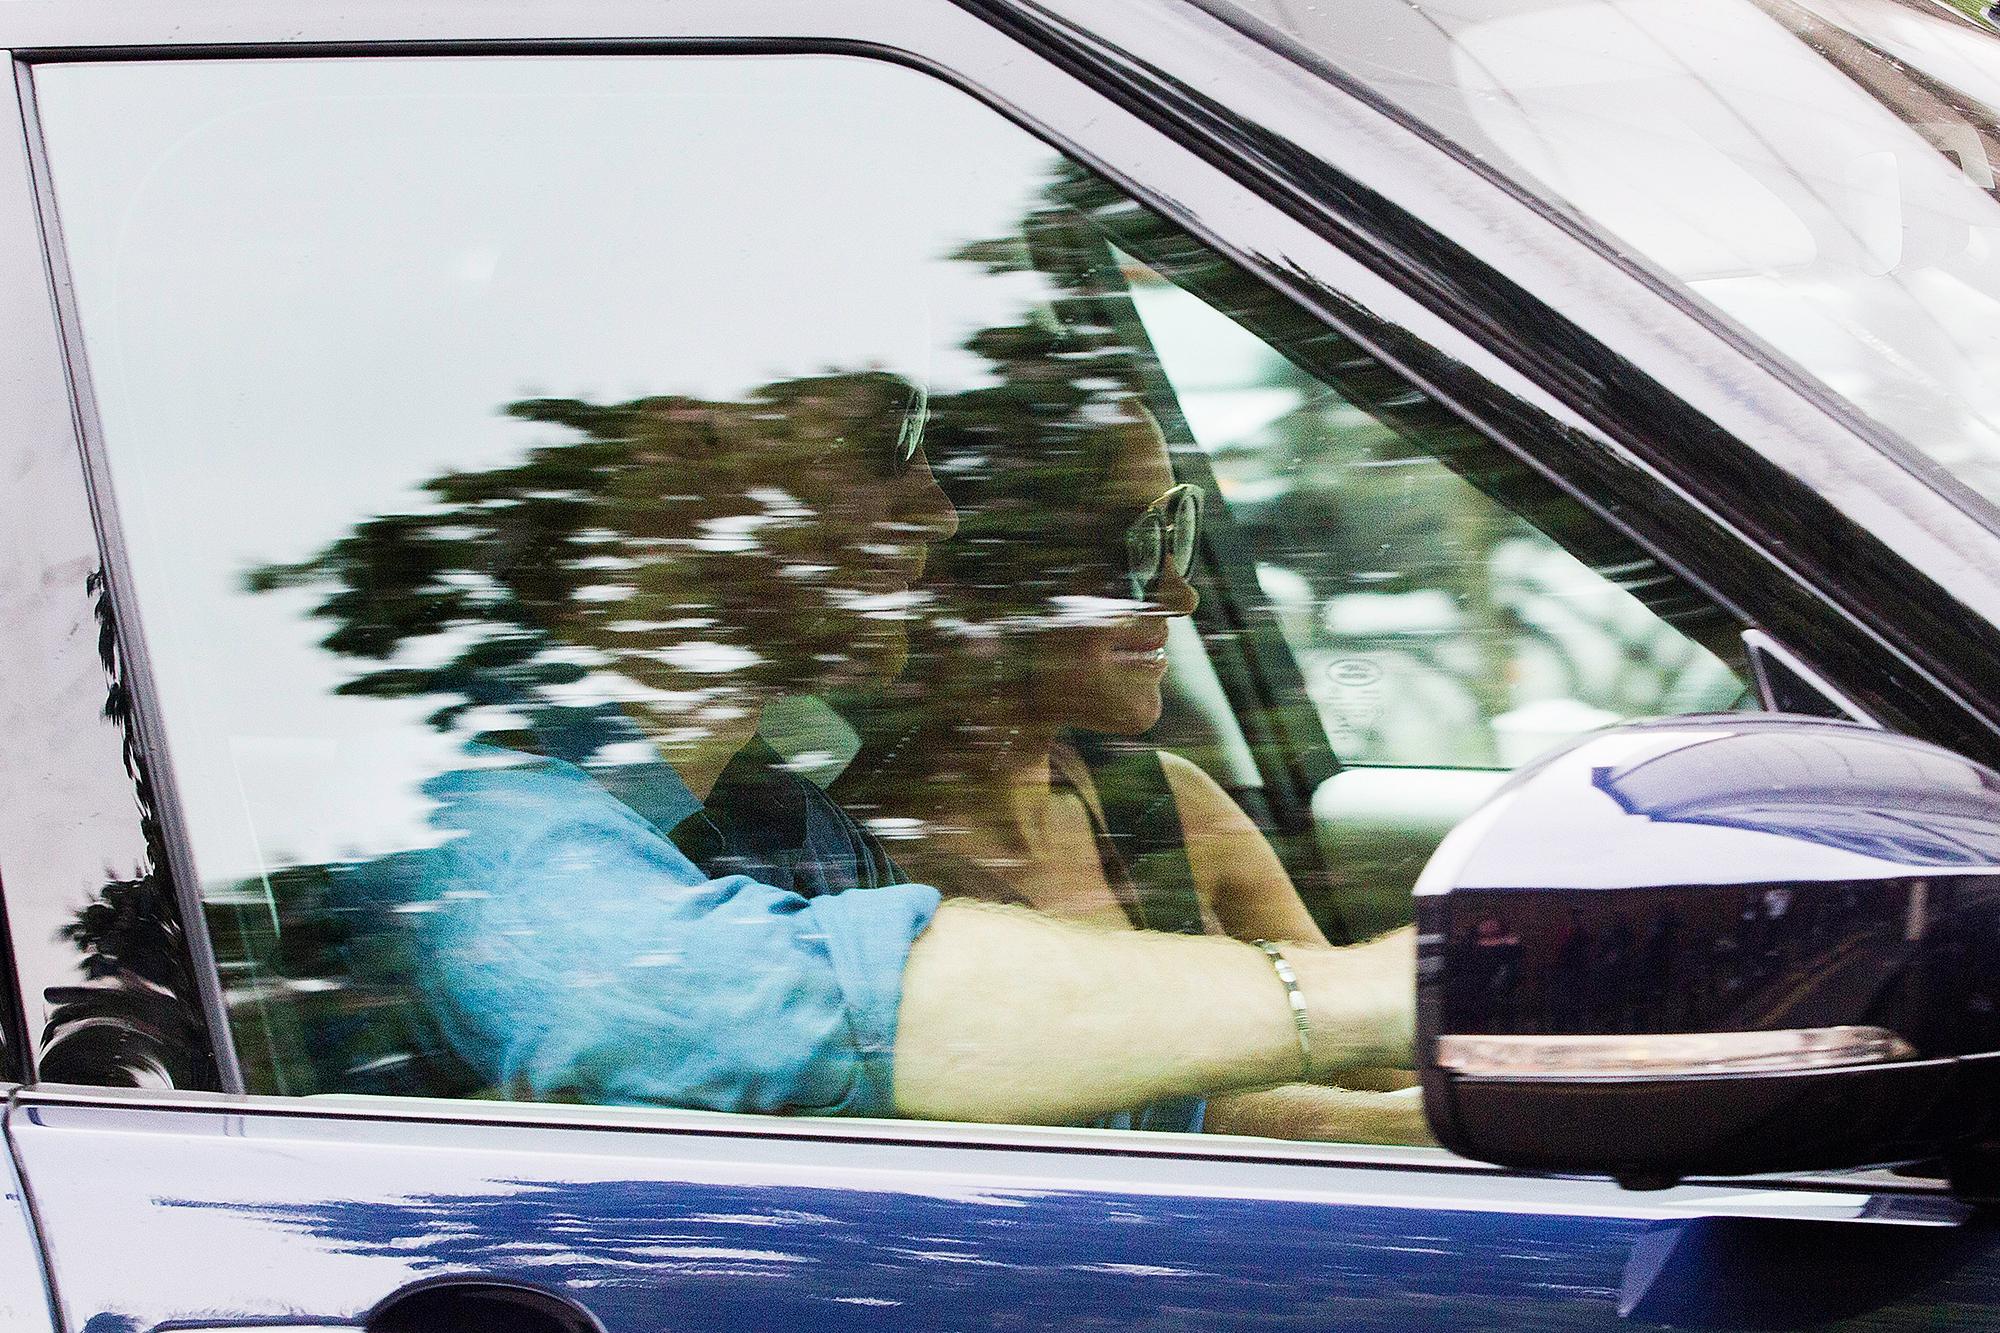 Prince Harry Meghan Markle Kensington Palace return